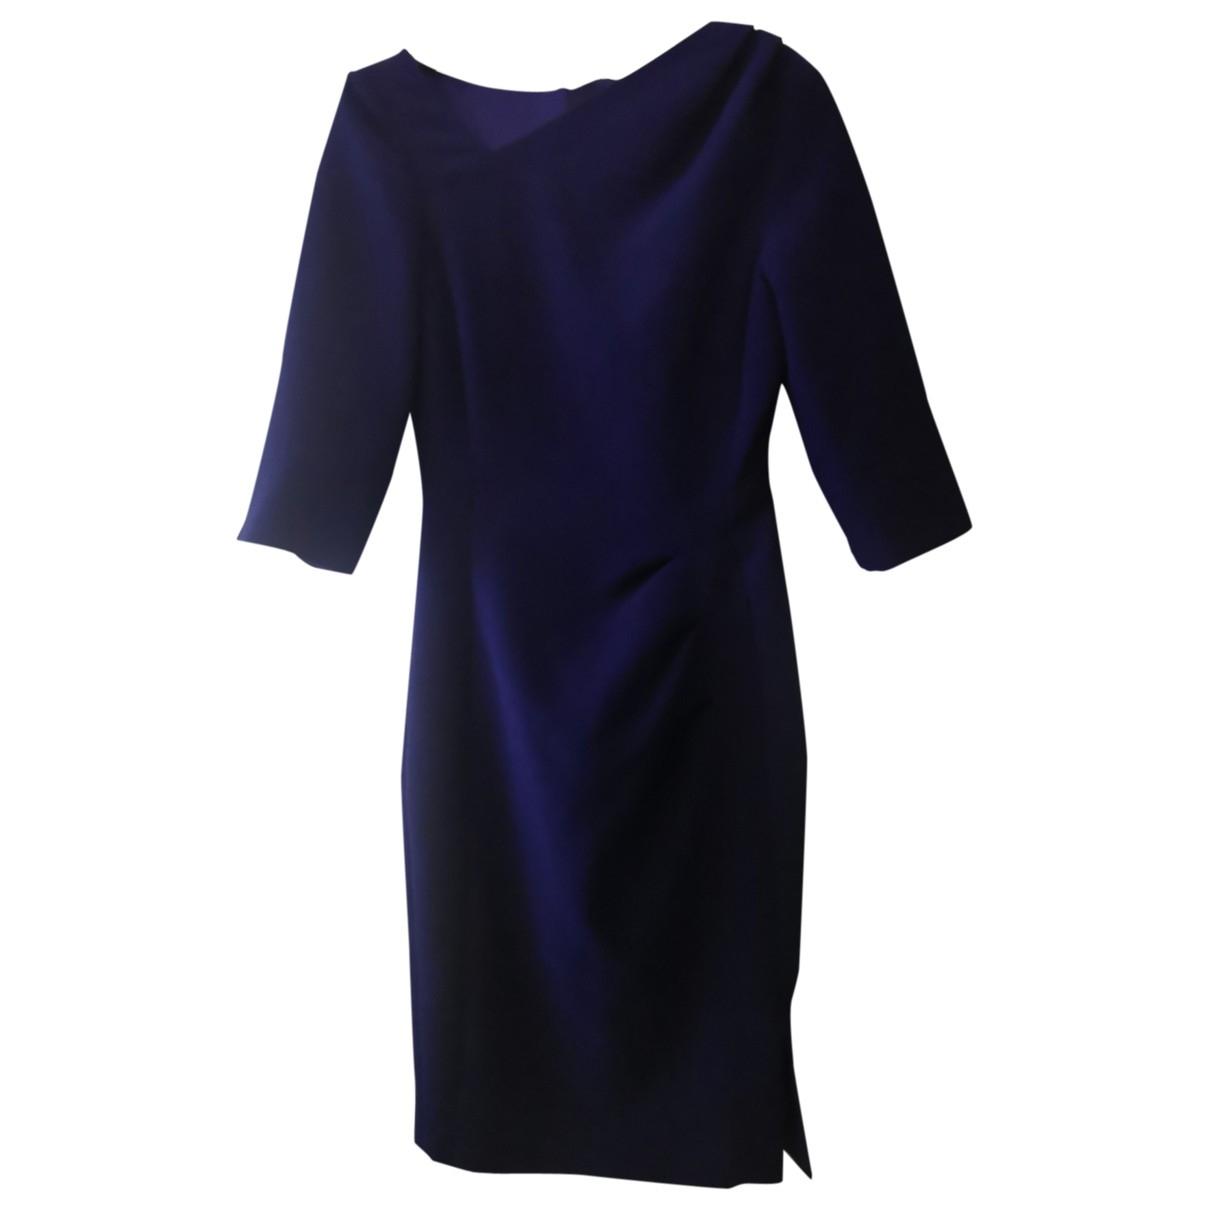 Lk Bennett - Robe   pour femme - bleu